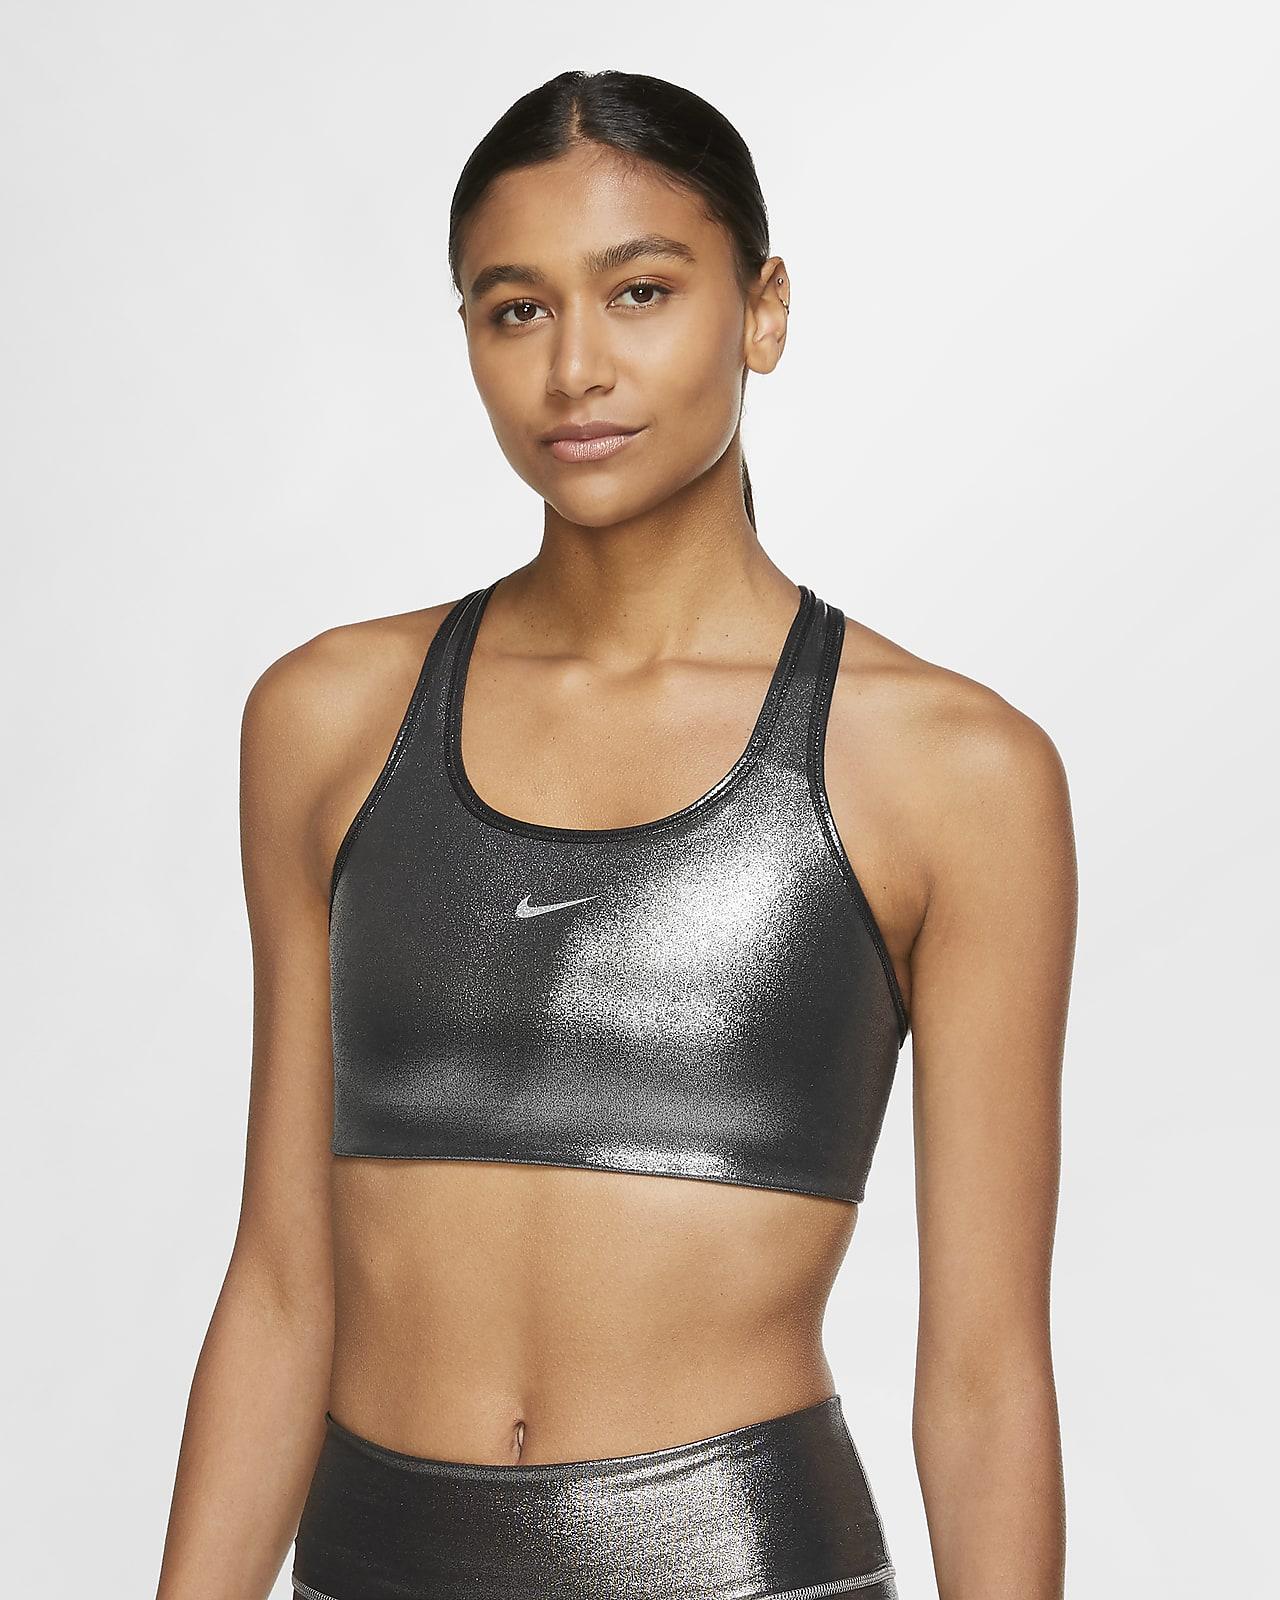 Nike Swoosh Icon Clash Shimmer Women's Medium-Support 1-Piece Pad Sports Bra